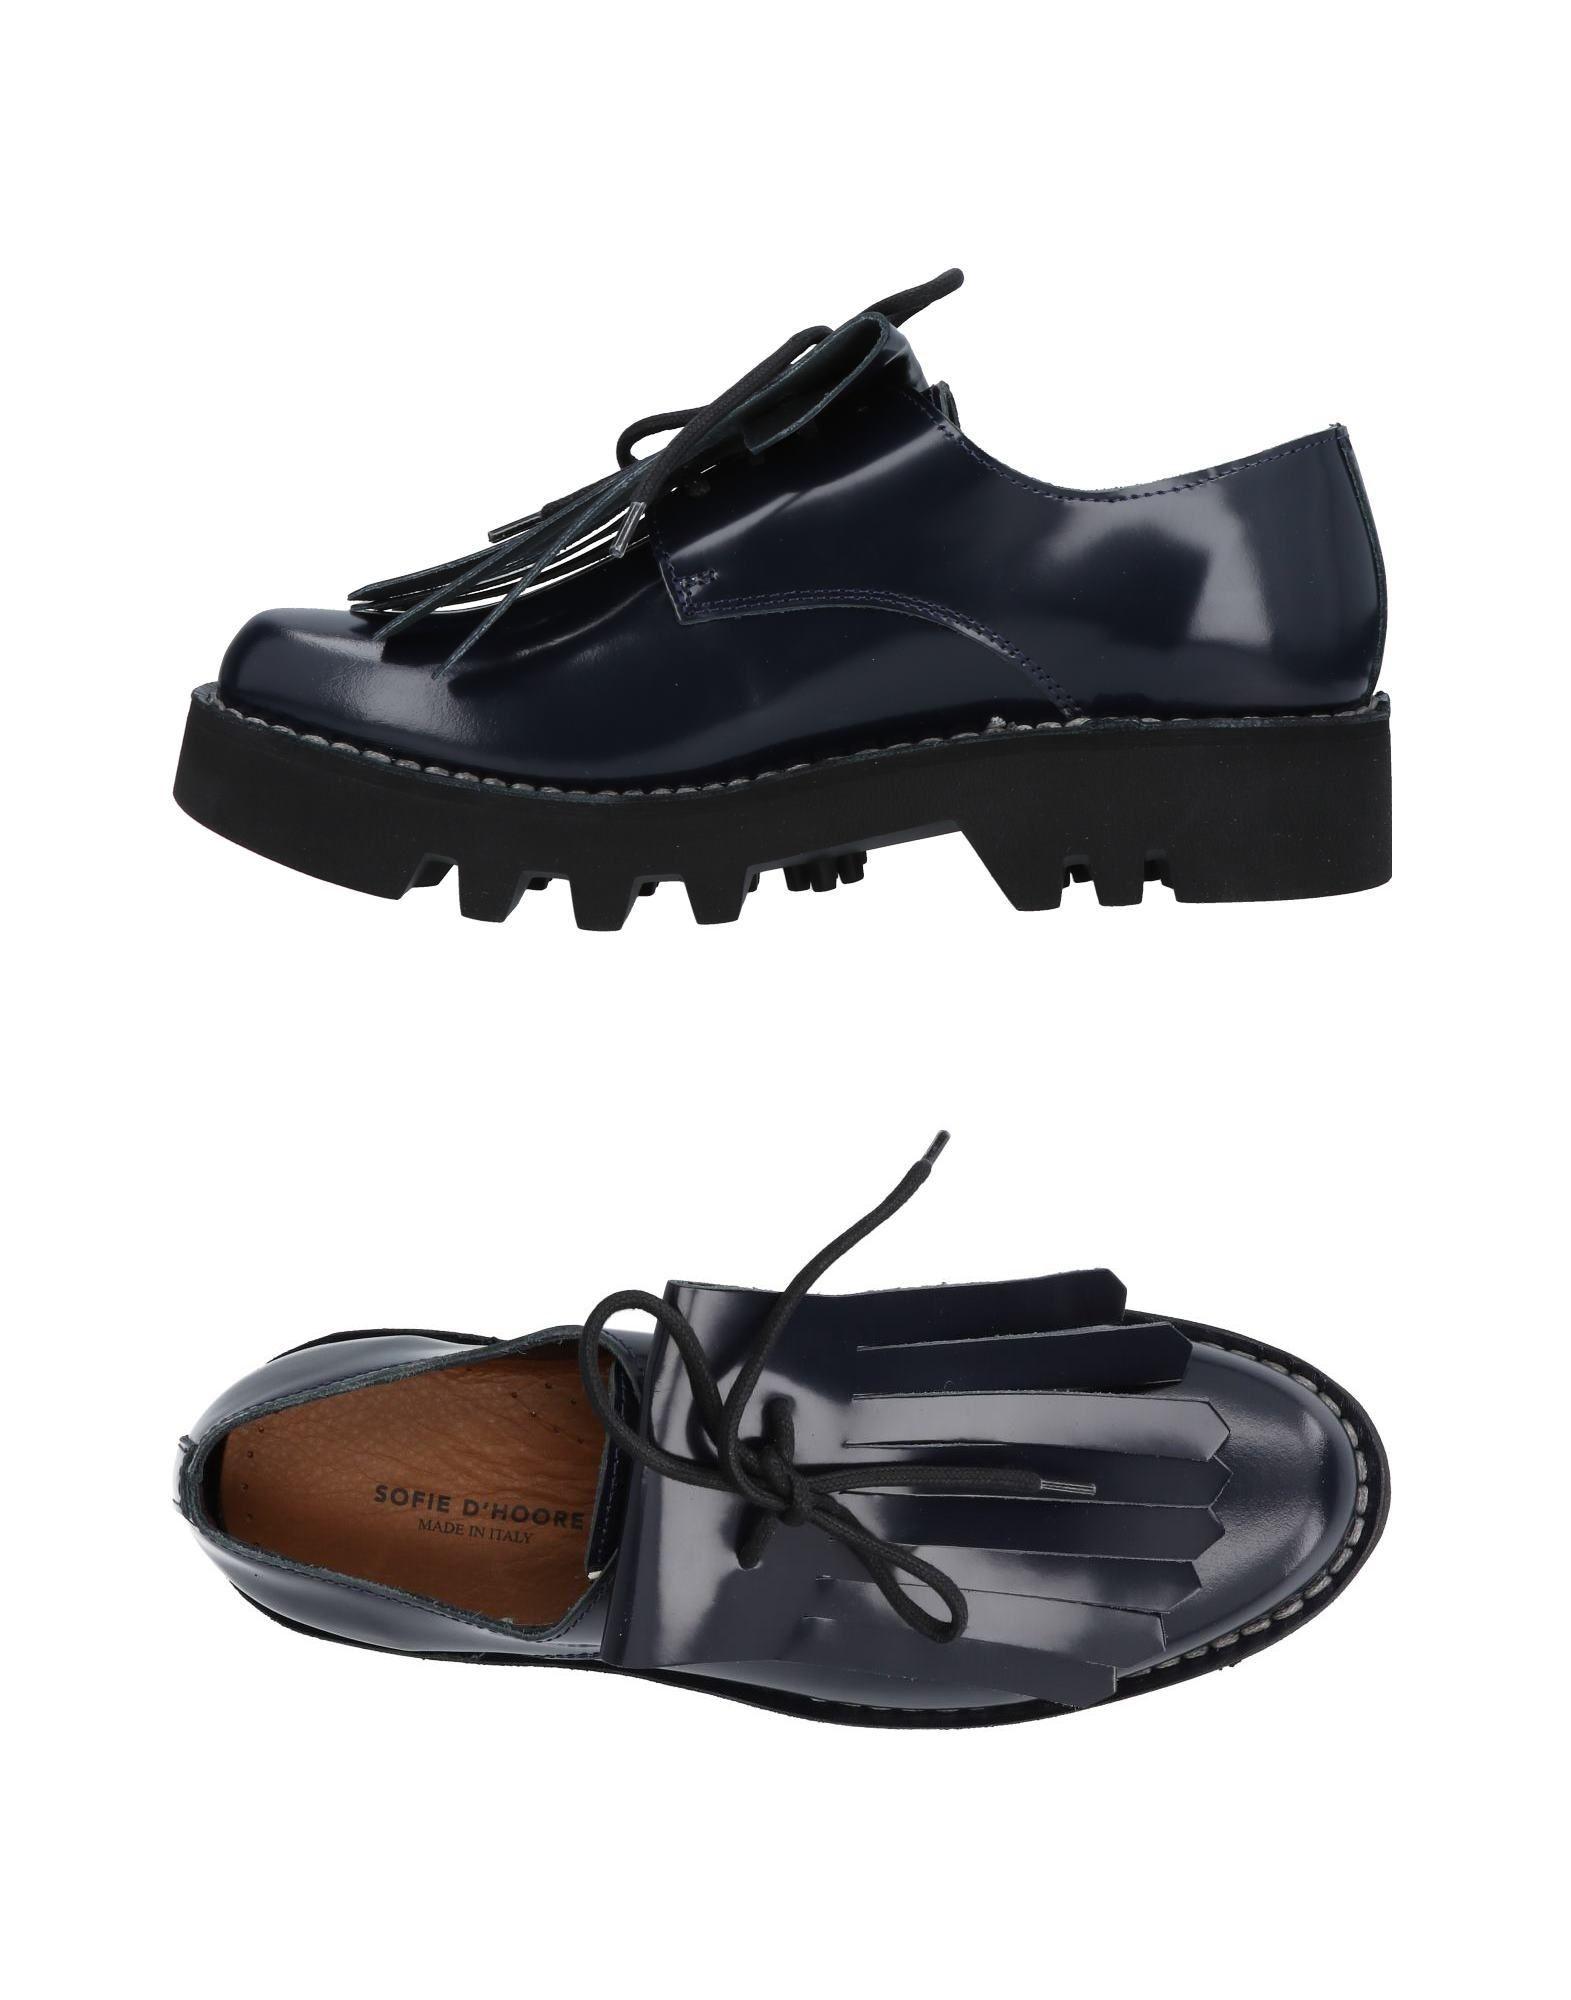 Rabatt Schuhe Sofie D'hoore Schnürschuhe Damen  11453766TA